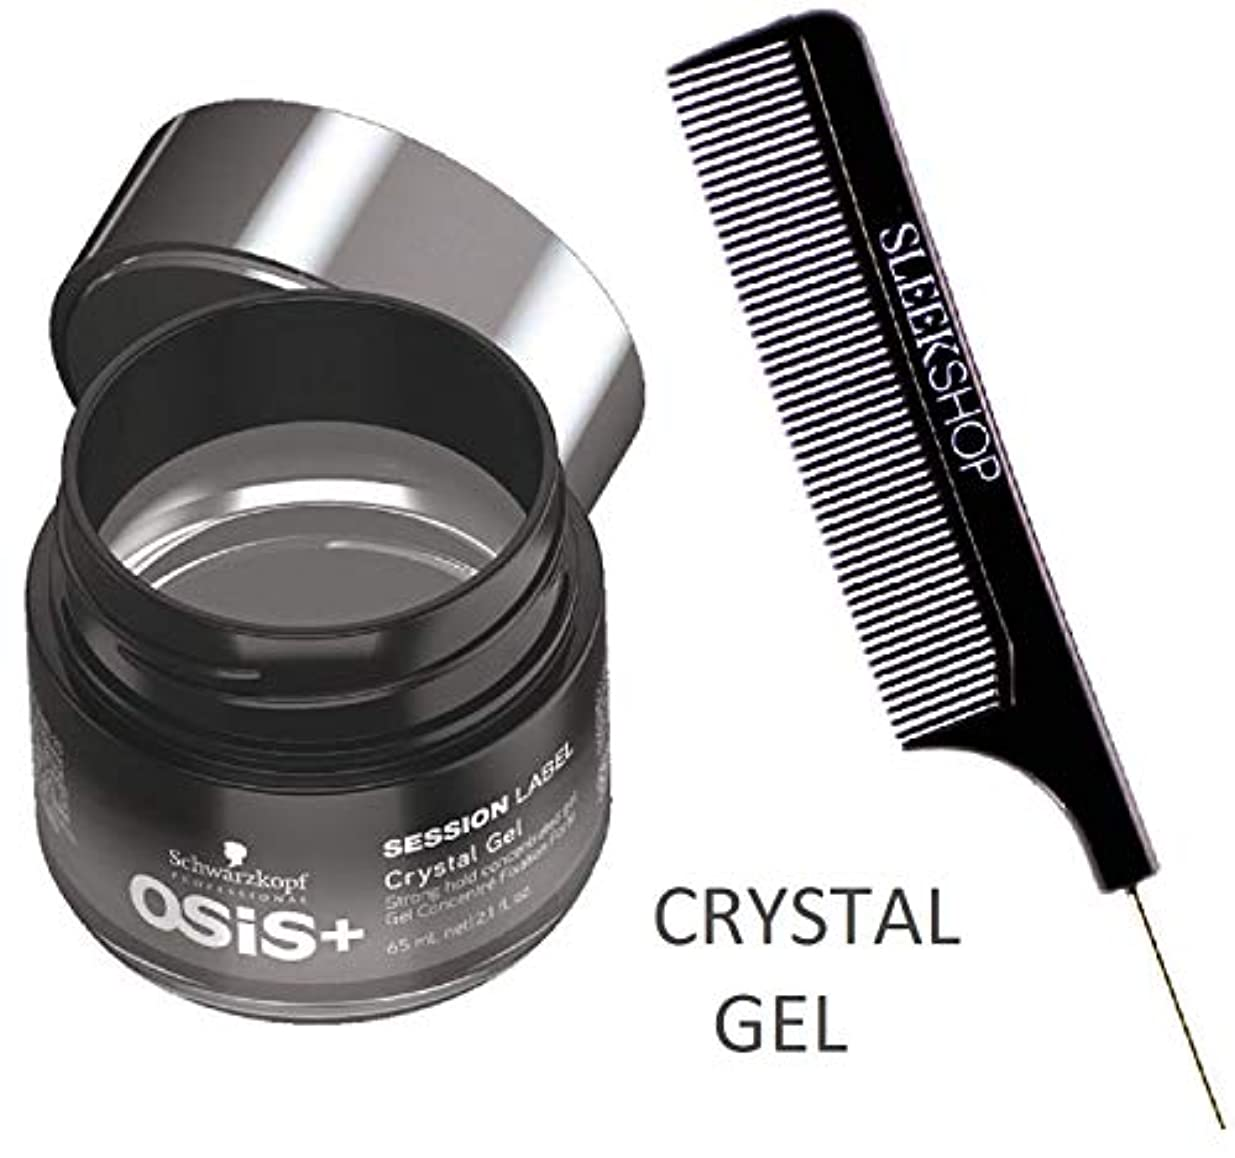 Schwarzkopf OSIS +セッションラベルCRYSTAL GELストロングホールド濃縮ジェル(STYLISTのKIT) 2.1オンス/ 65ミリリットル